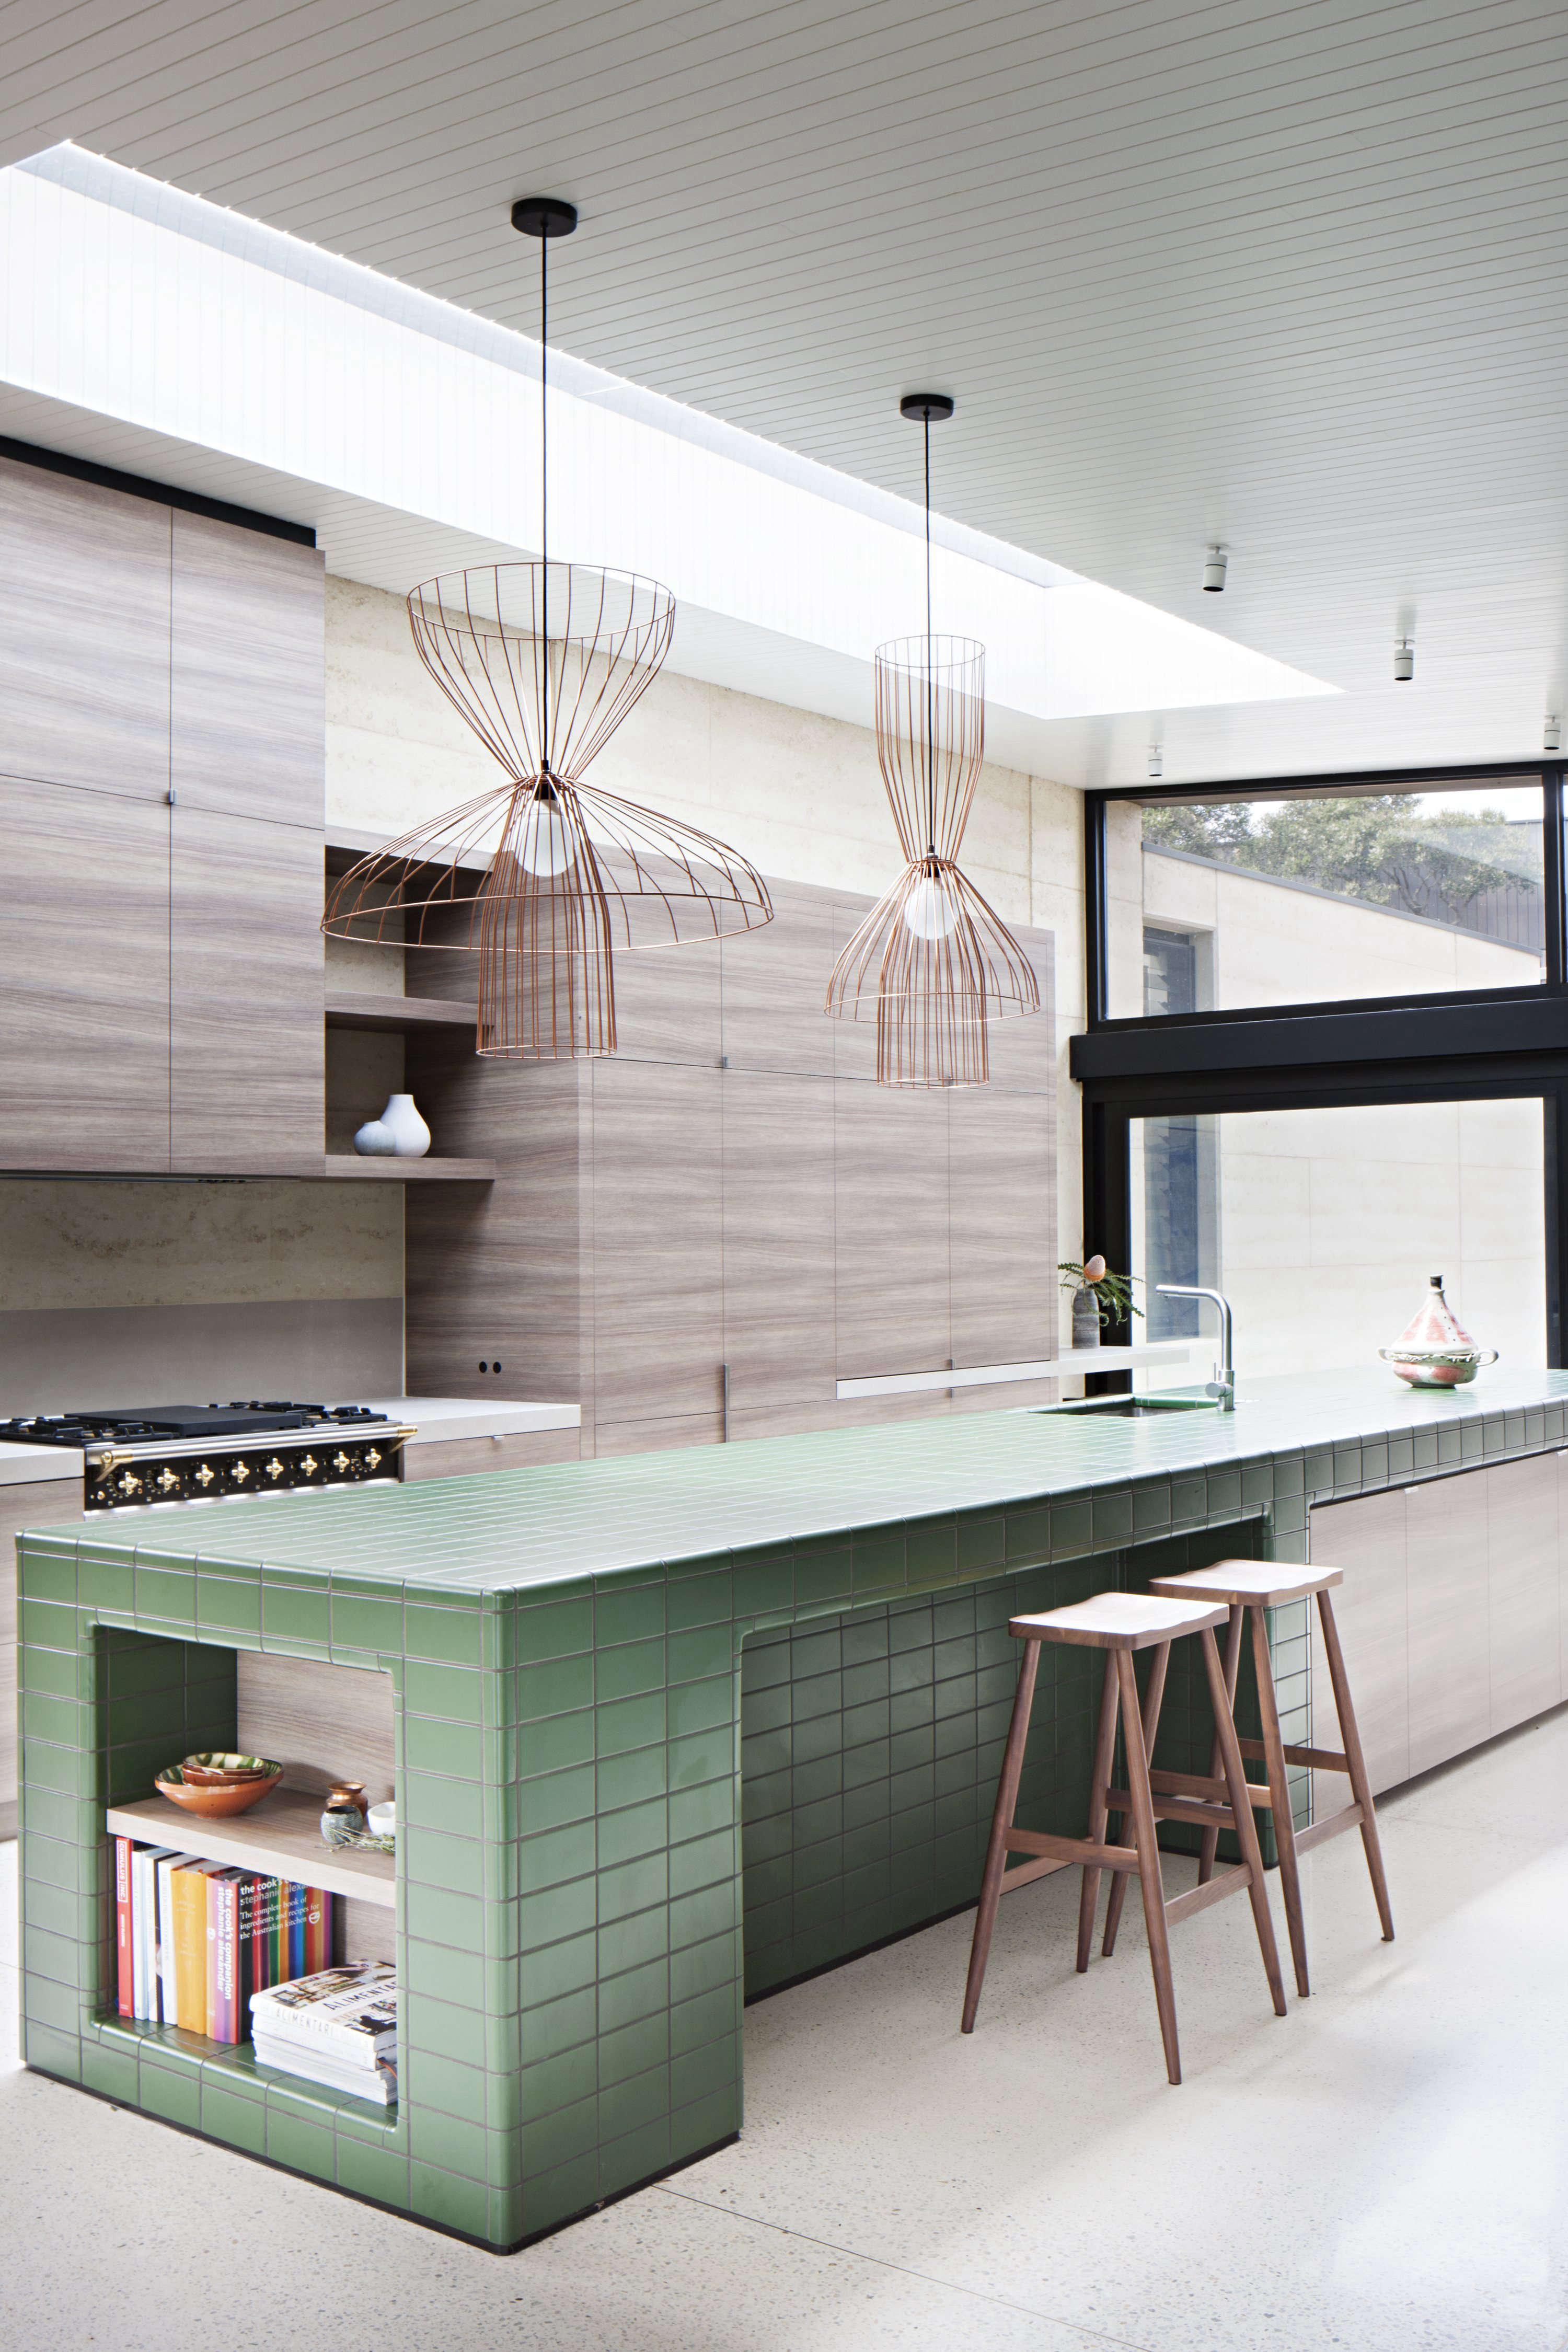 layer house tiled kitchen island australia robertson rak architects shannon mcgrath photo 3